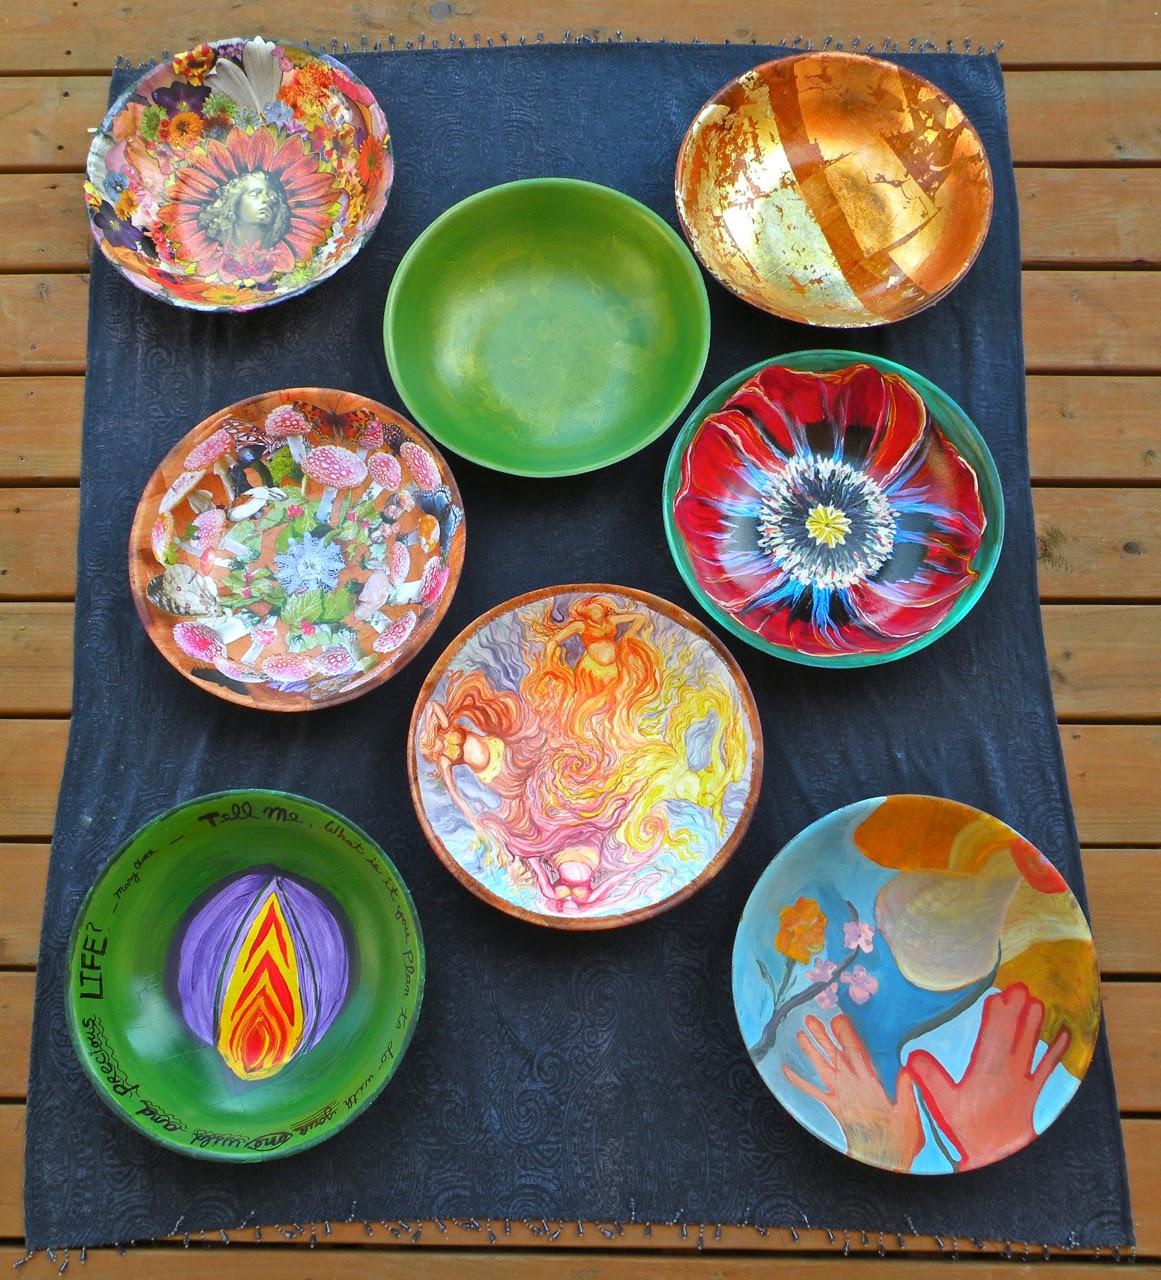 Animas Ceremony: Offering Art Bowls